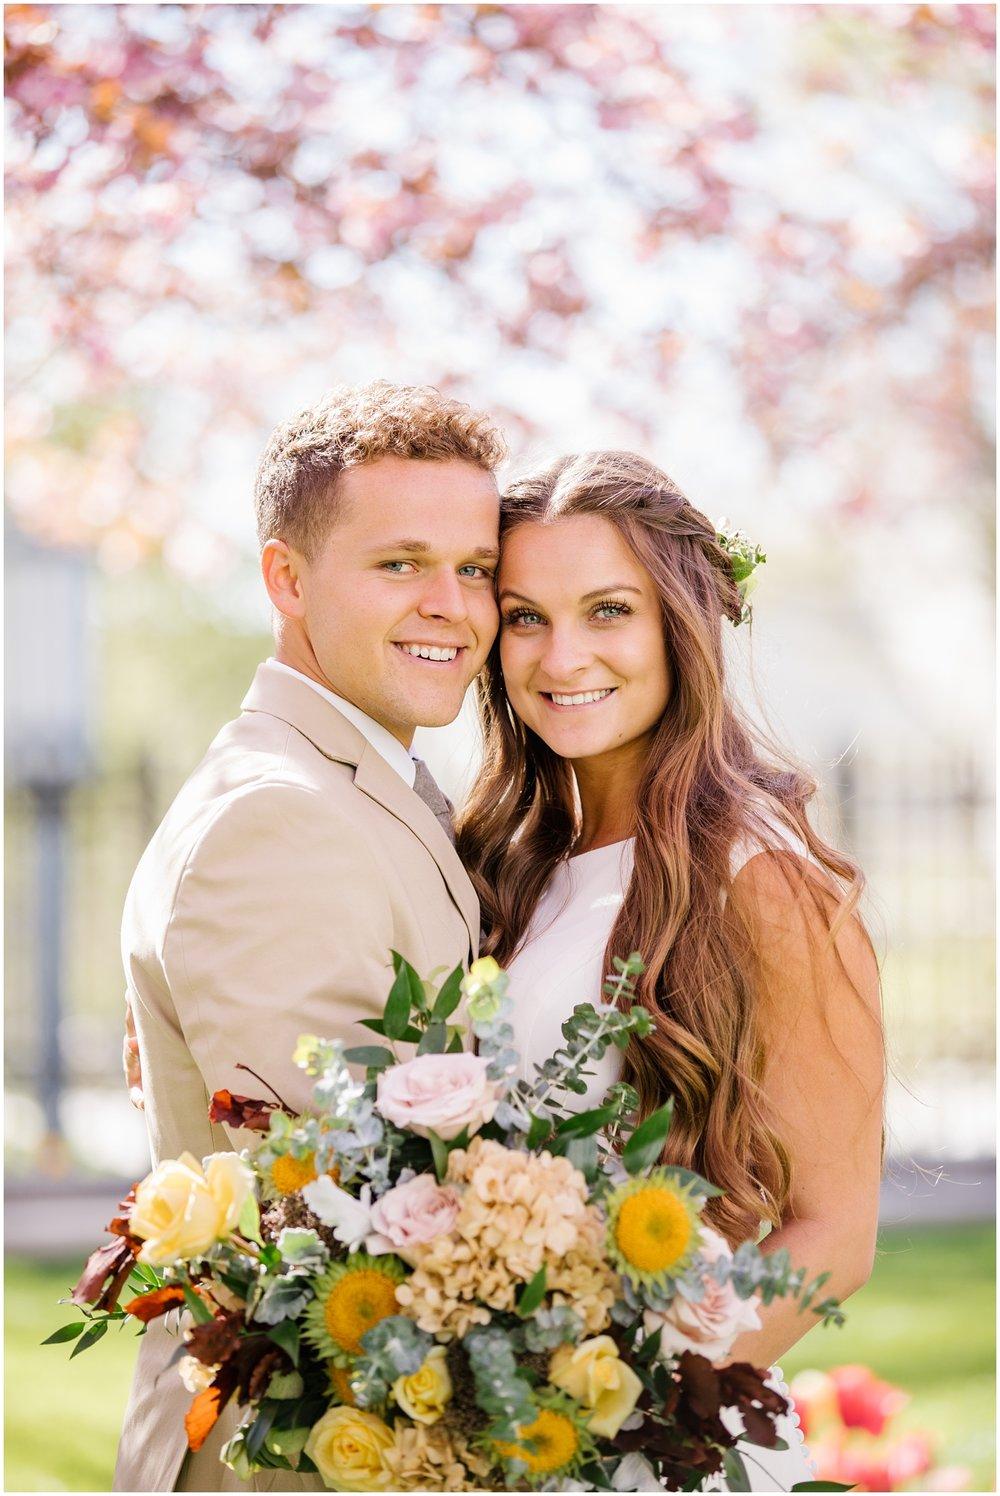 JC-Wedding-164_Lizzie-B-Imagery-Utah-Wedding-Photographer-Park-City-Salt-Lake-City-Temple-Joseph-Smith-Memorial-Building-Empire-Room.jpg